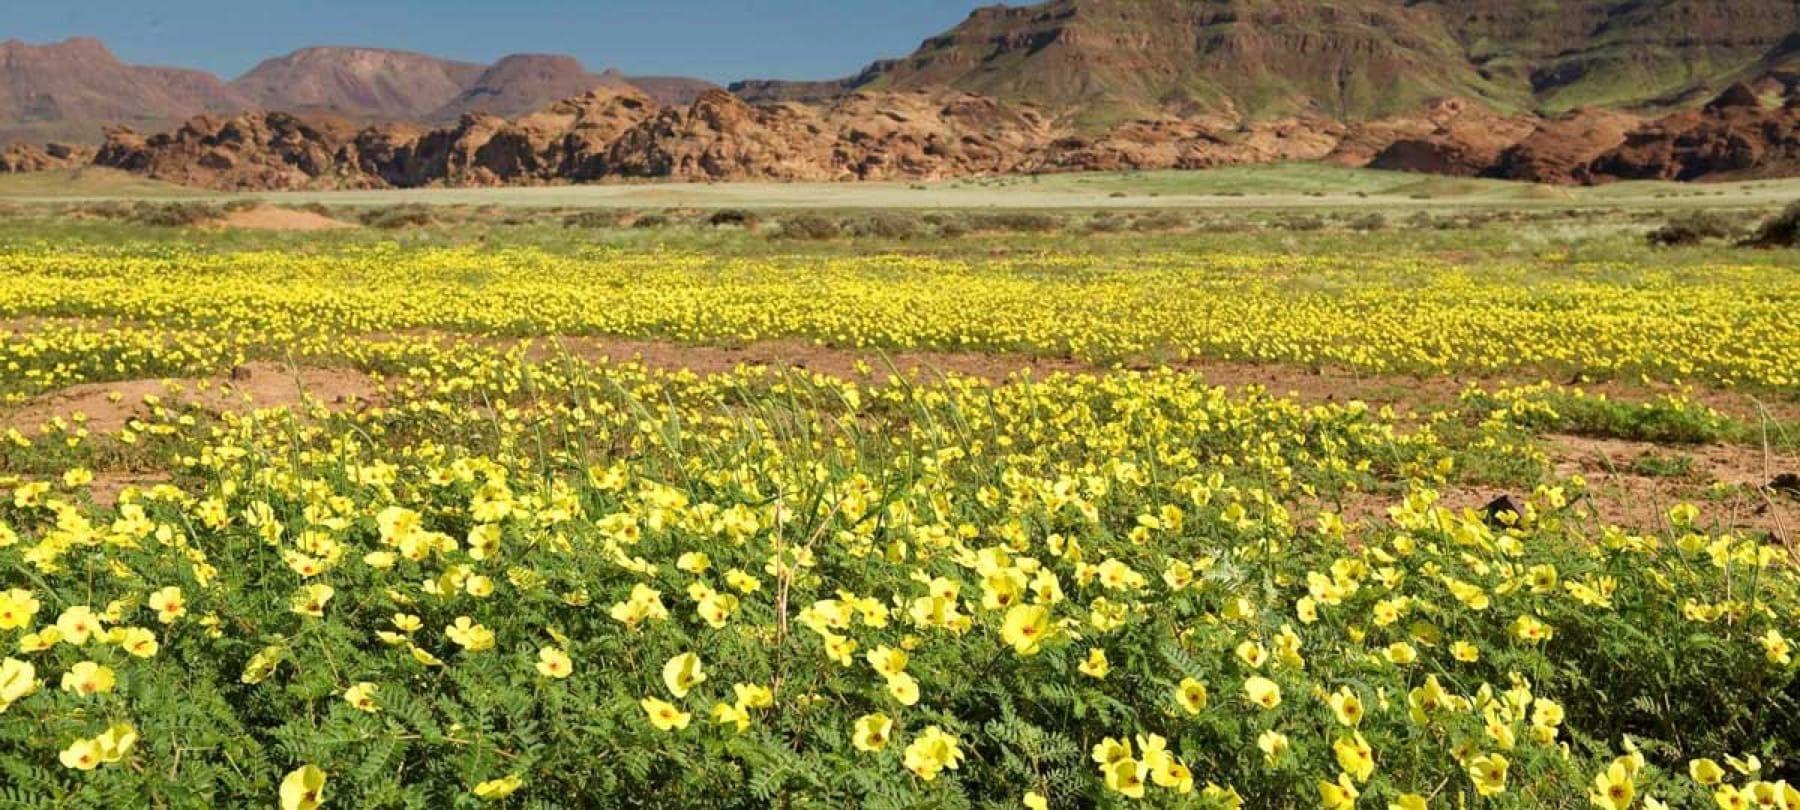 damaraland spring